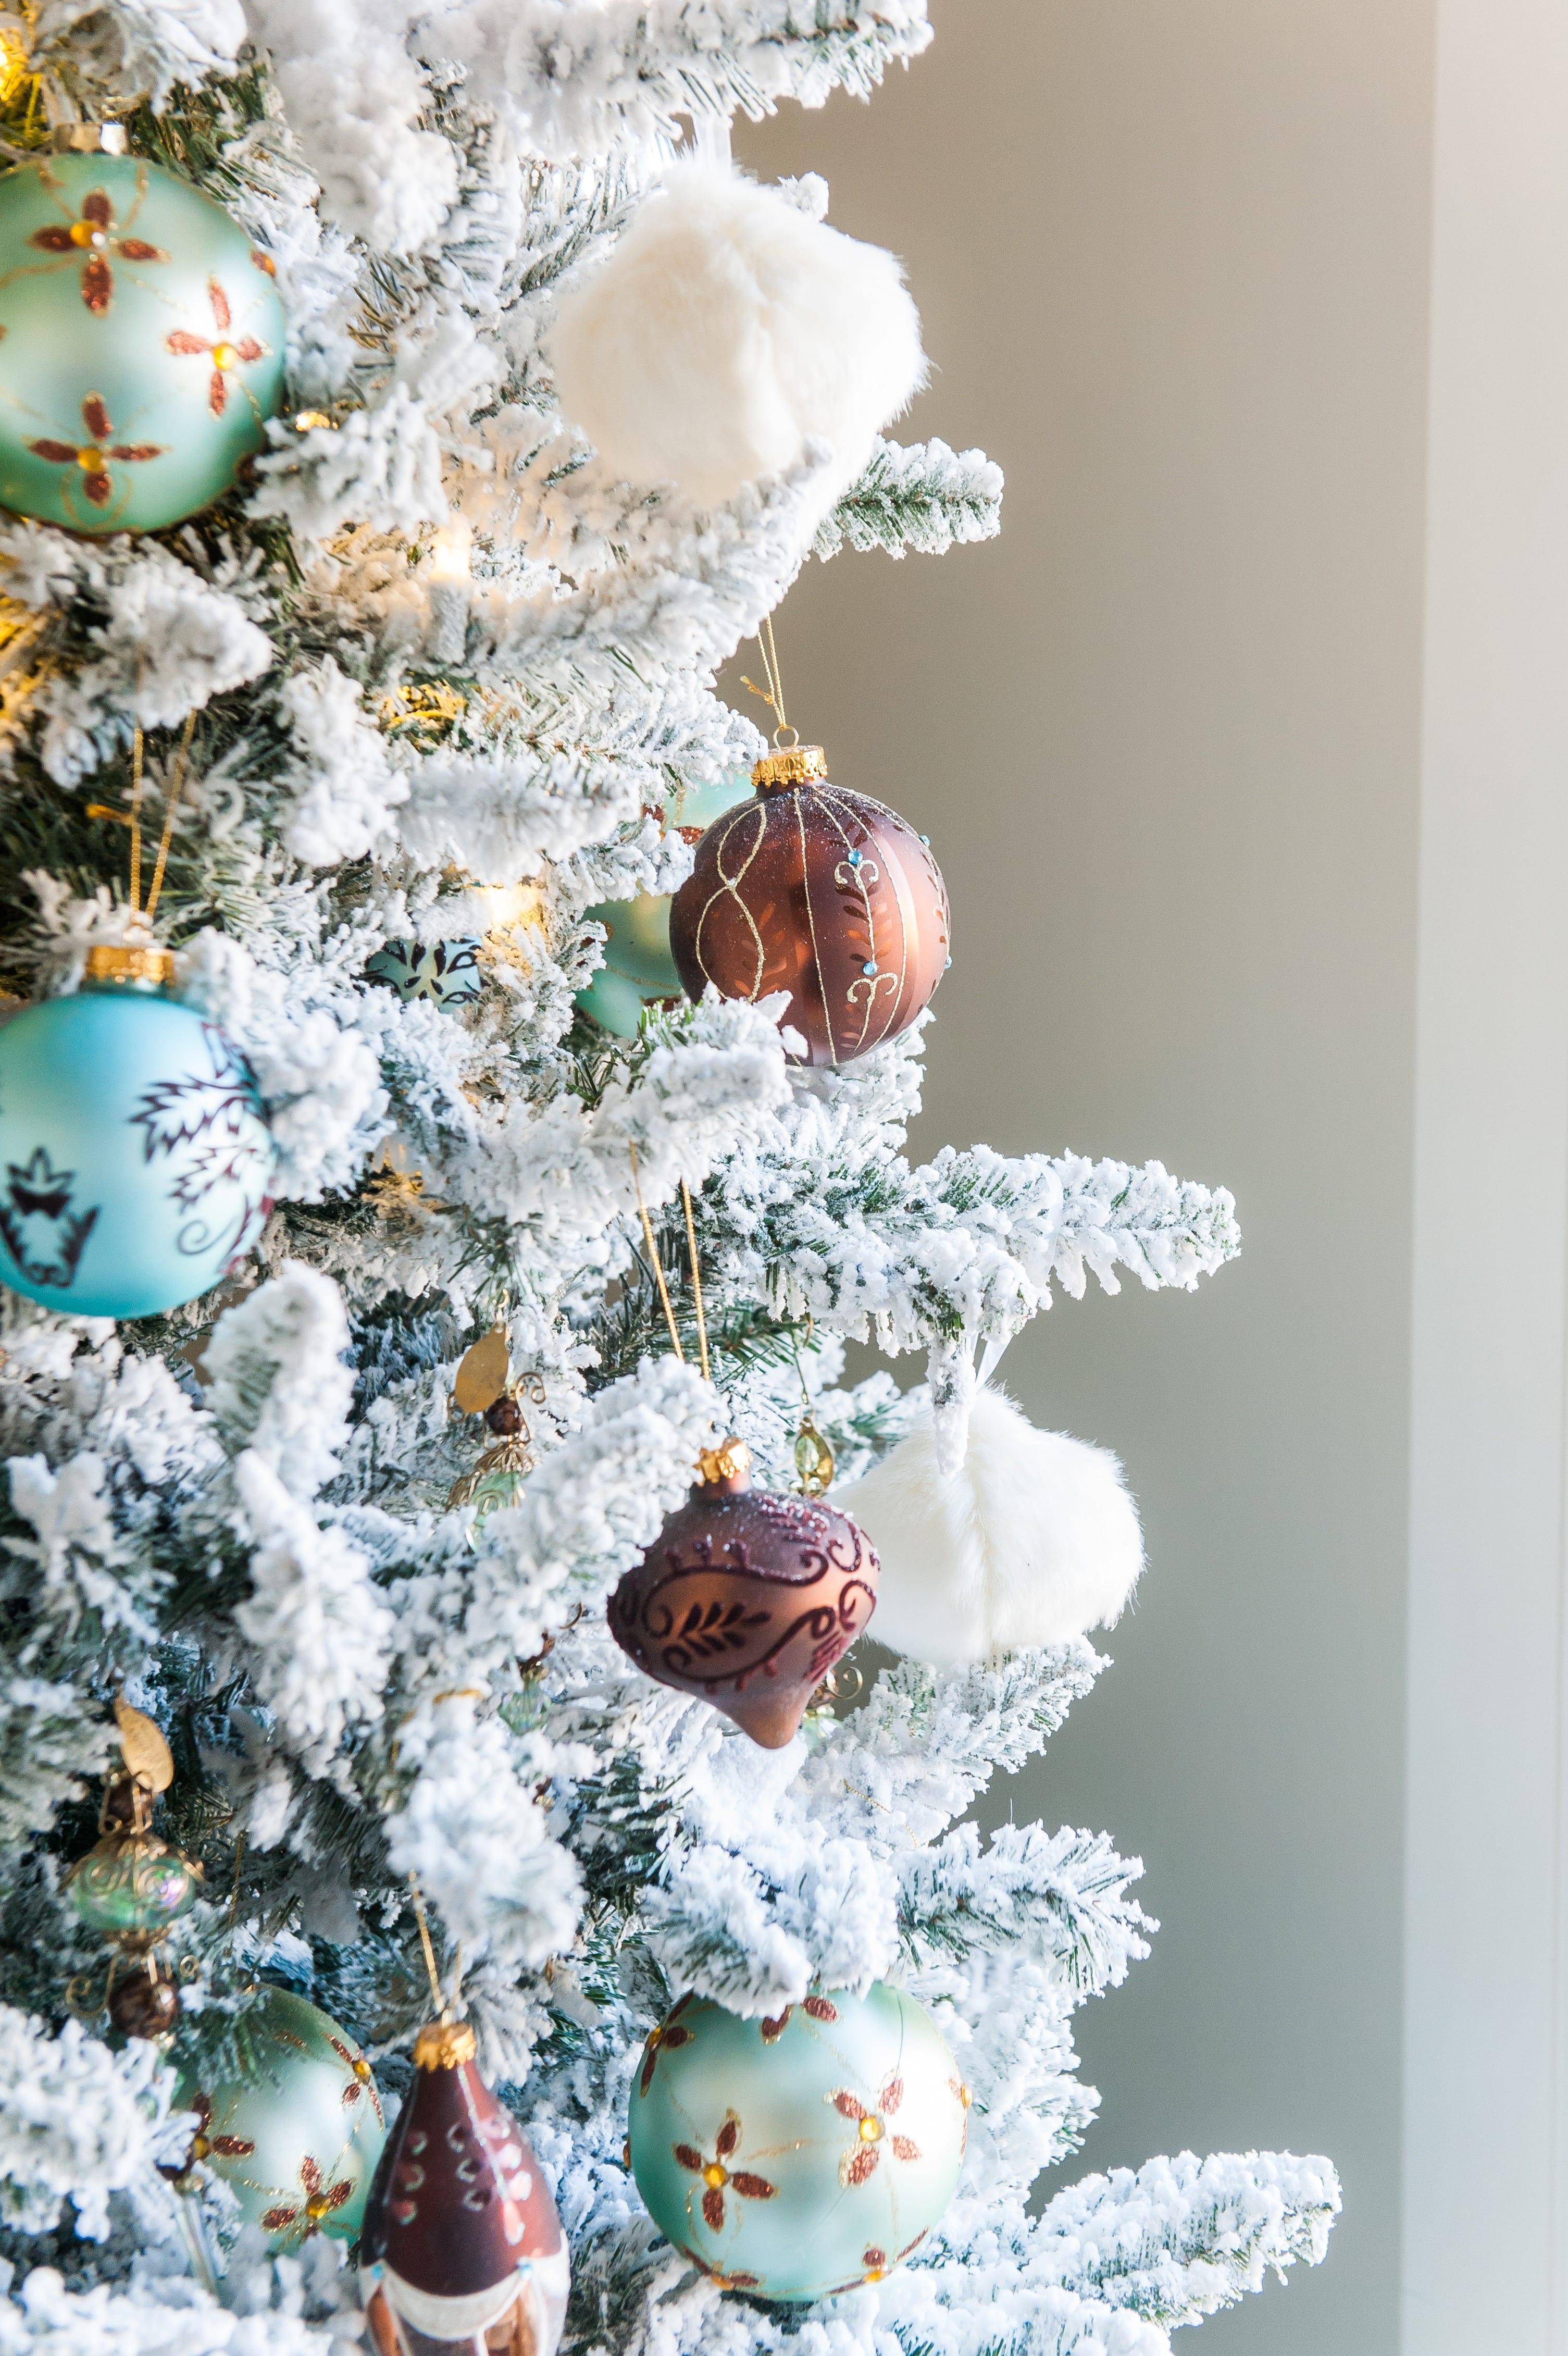 Christmas tree flocked long needle pine christmas tree flocked tree blue decor blue christmas ornaments trimming the tree shades of blue on white blue and cream flocked long needle pine artificial tree blue white ivory cream silver ornaments plaid ribbon